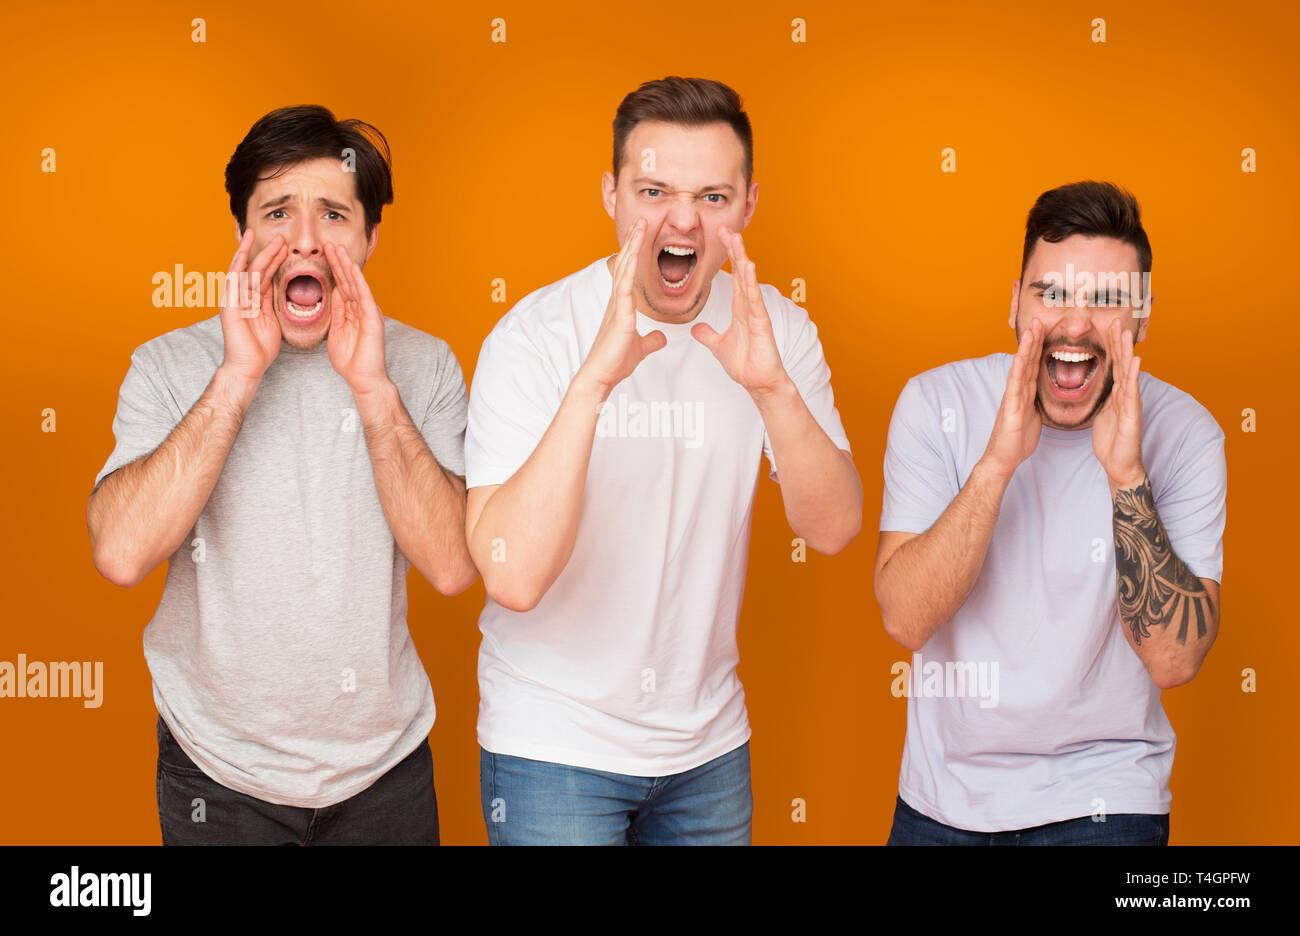 Men screaming loudly over orange studio background - Stock Image